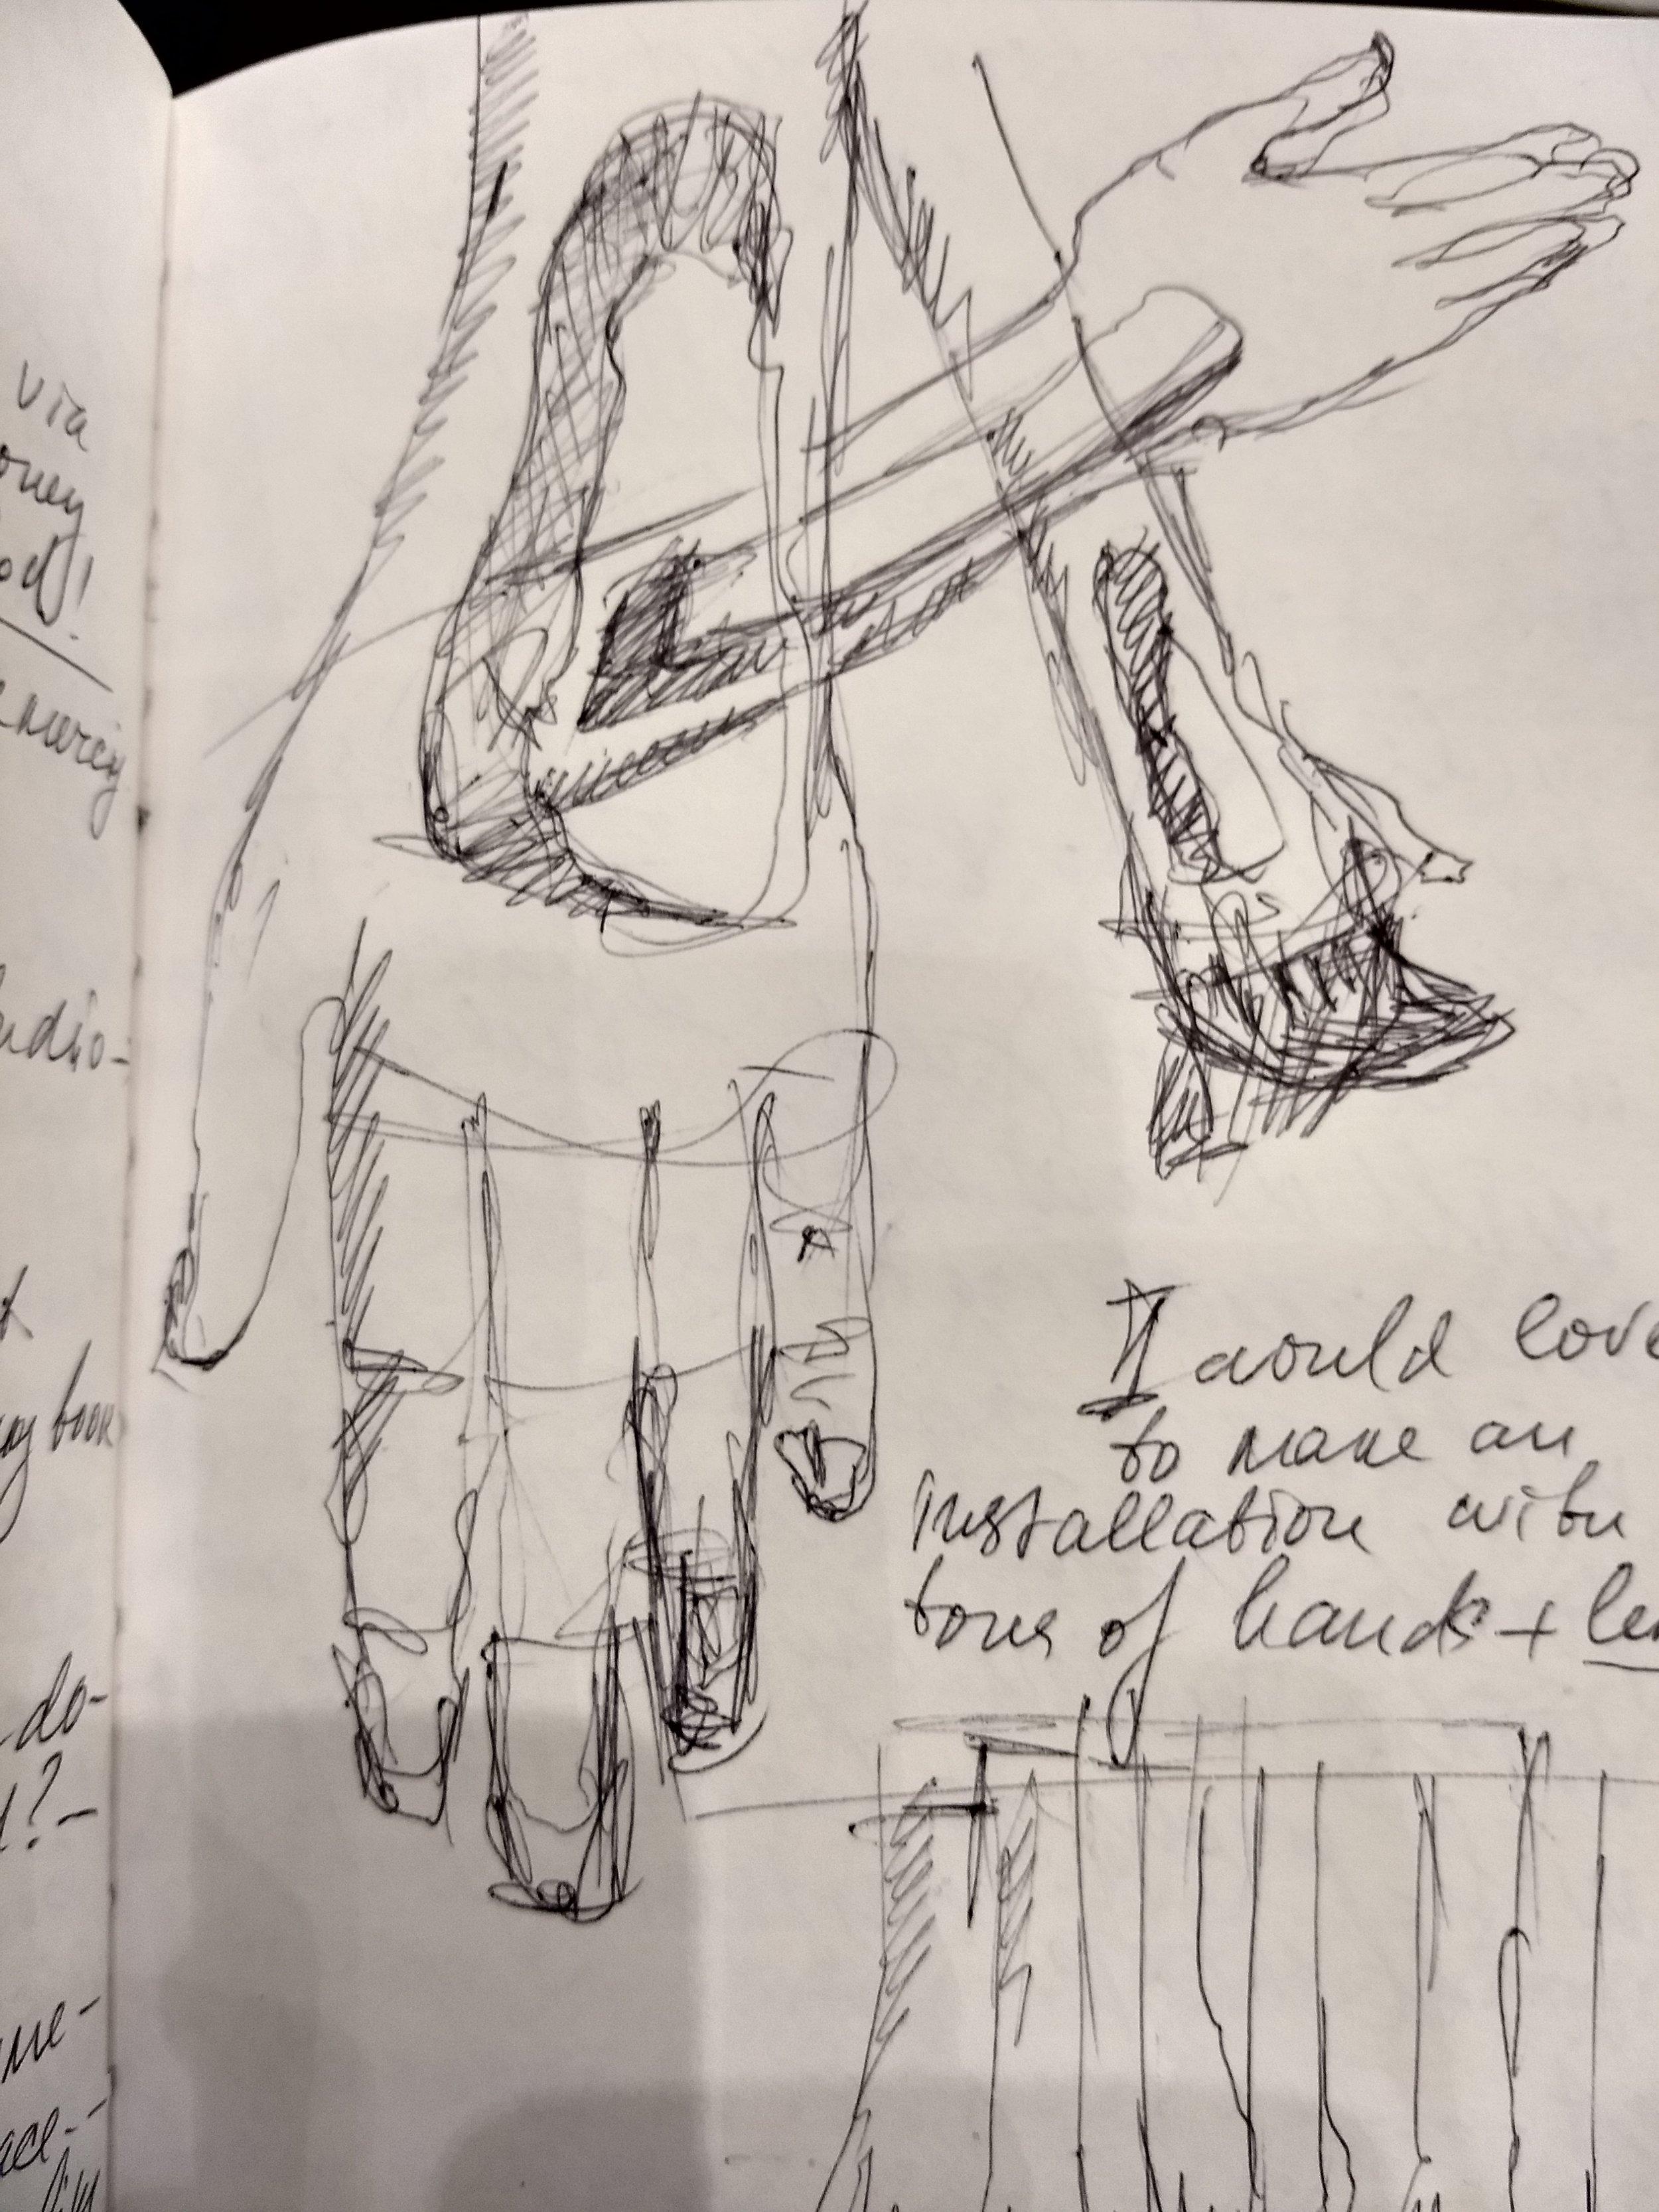 hands-tesseract-sketch-mirena-rhee_02.jpg